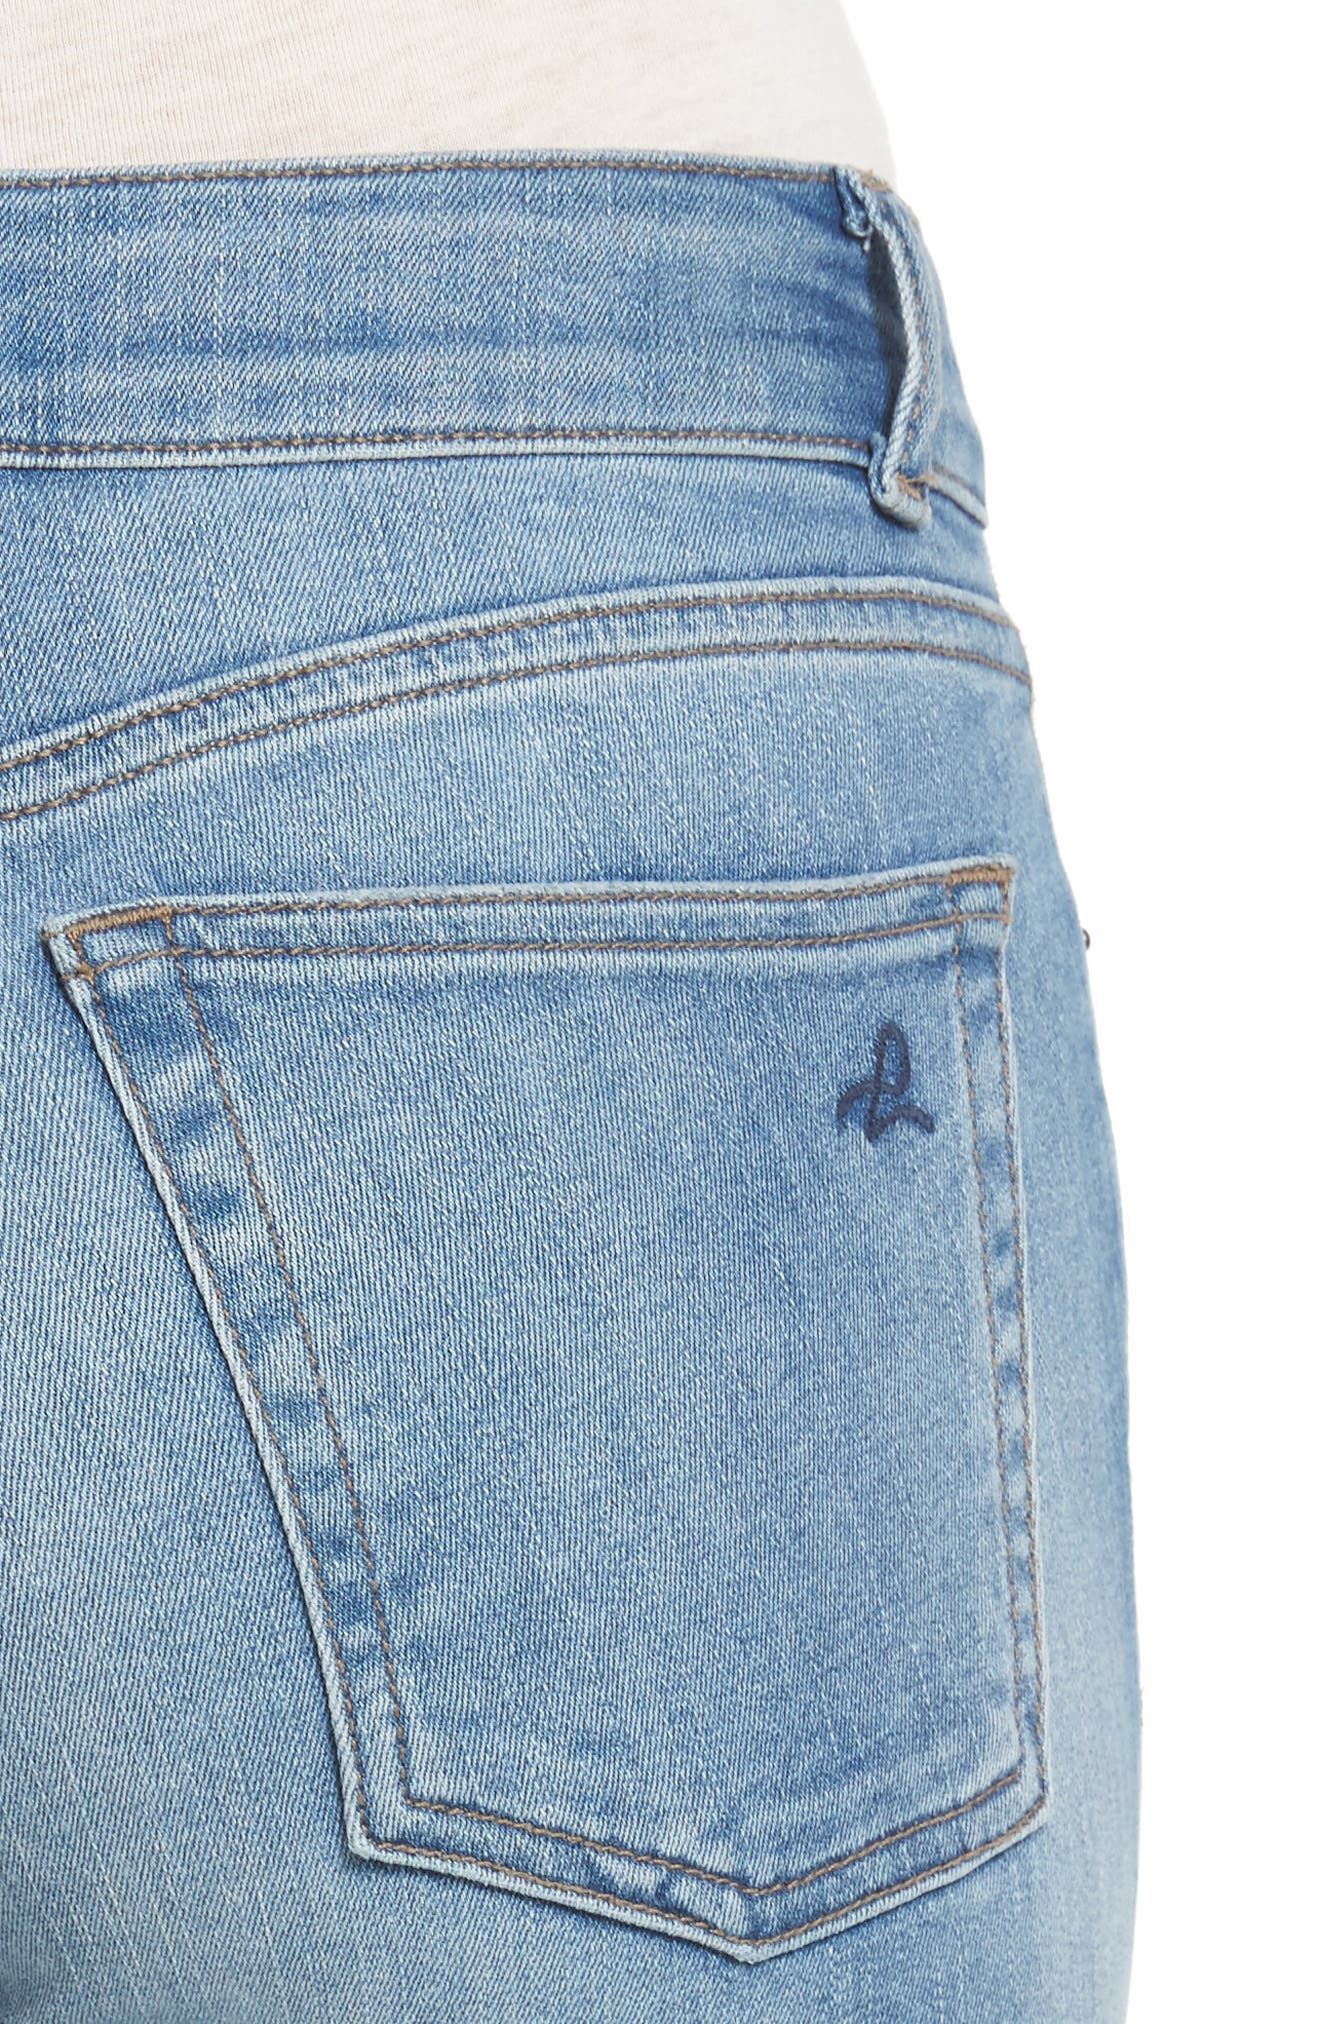 Alternate Image 4  - DL1961 Florence Instasculpt Skinny Jeans (Atwood)